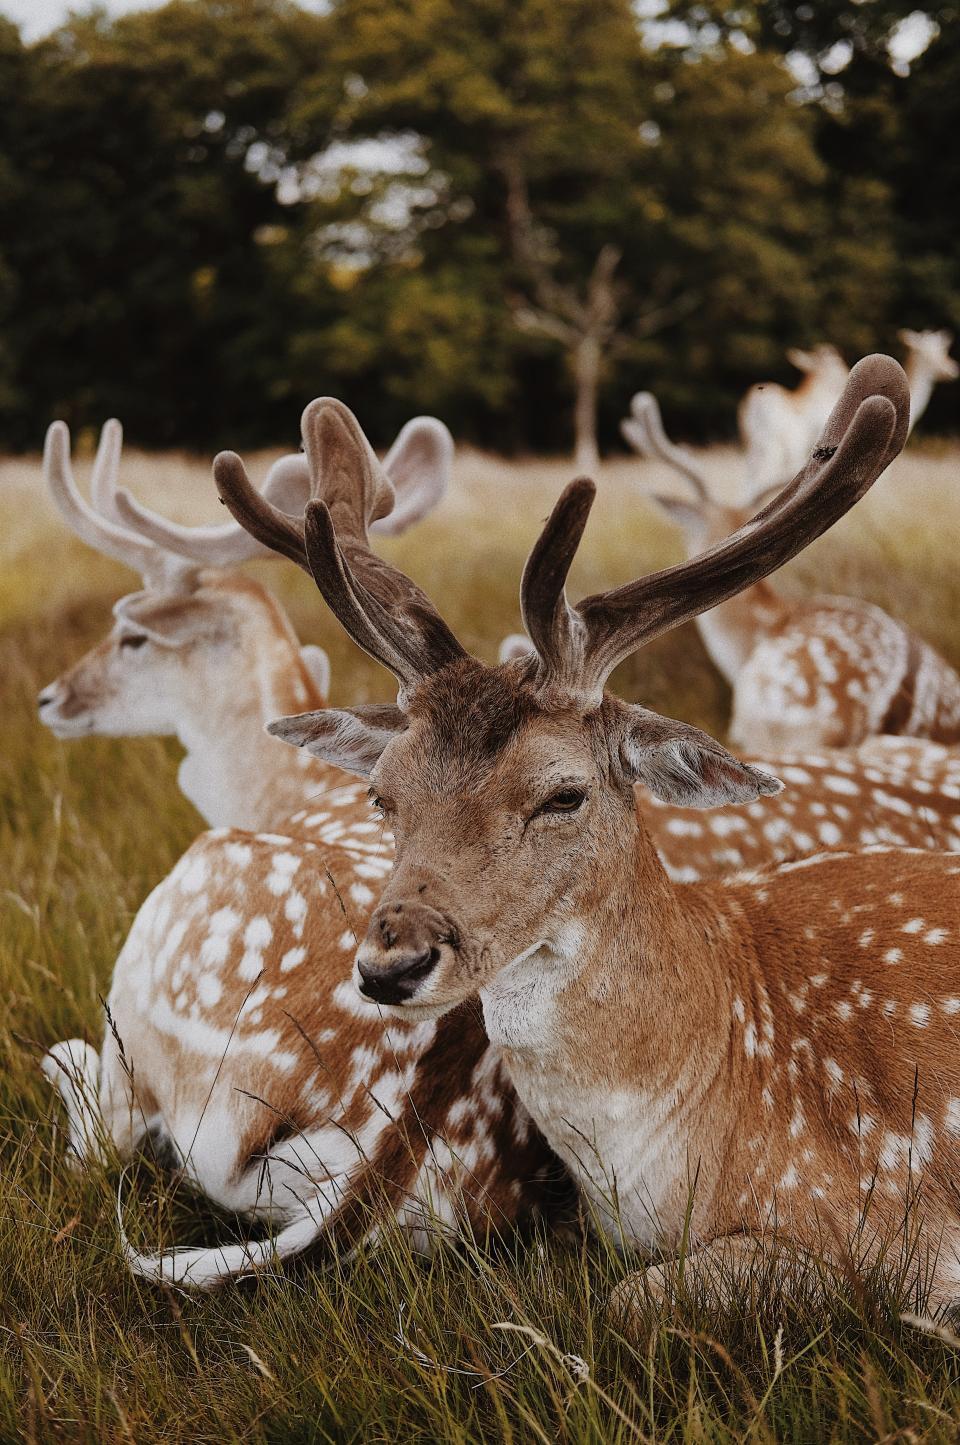 deer animal horn wildlife forest green grass tree outdoor nature herd rest